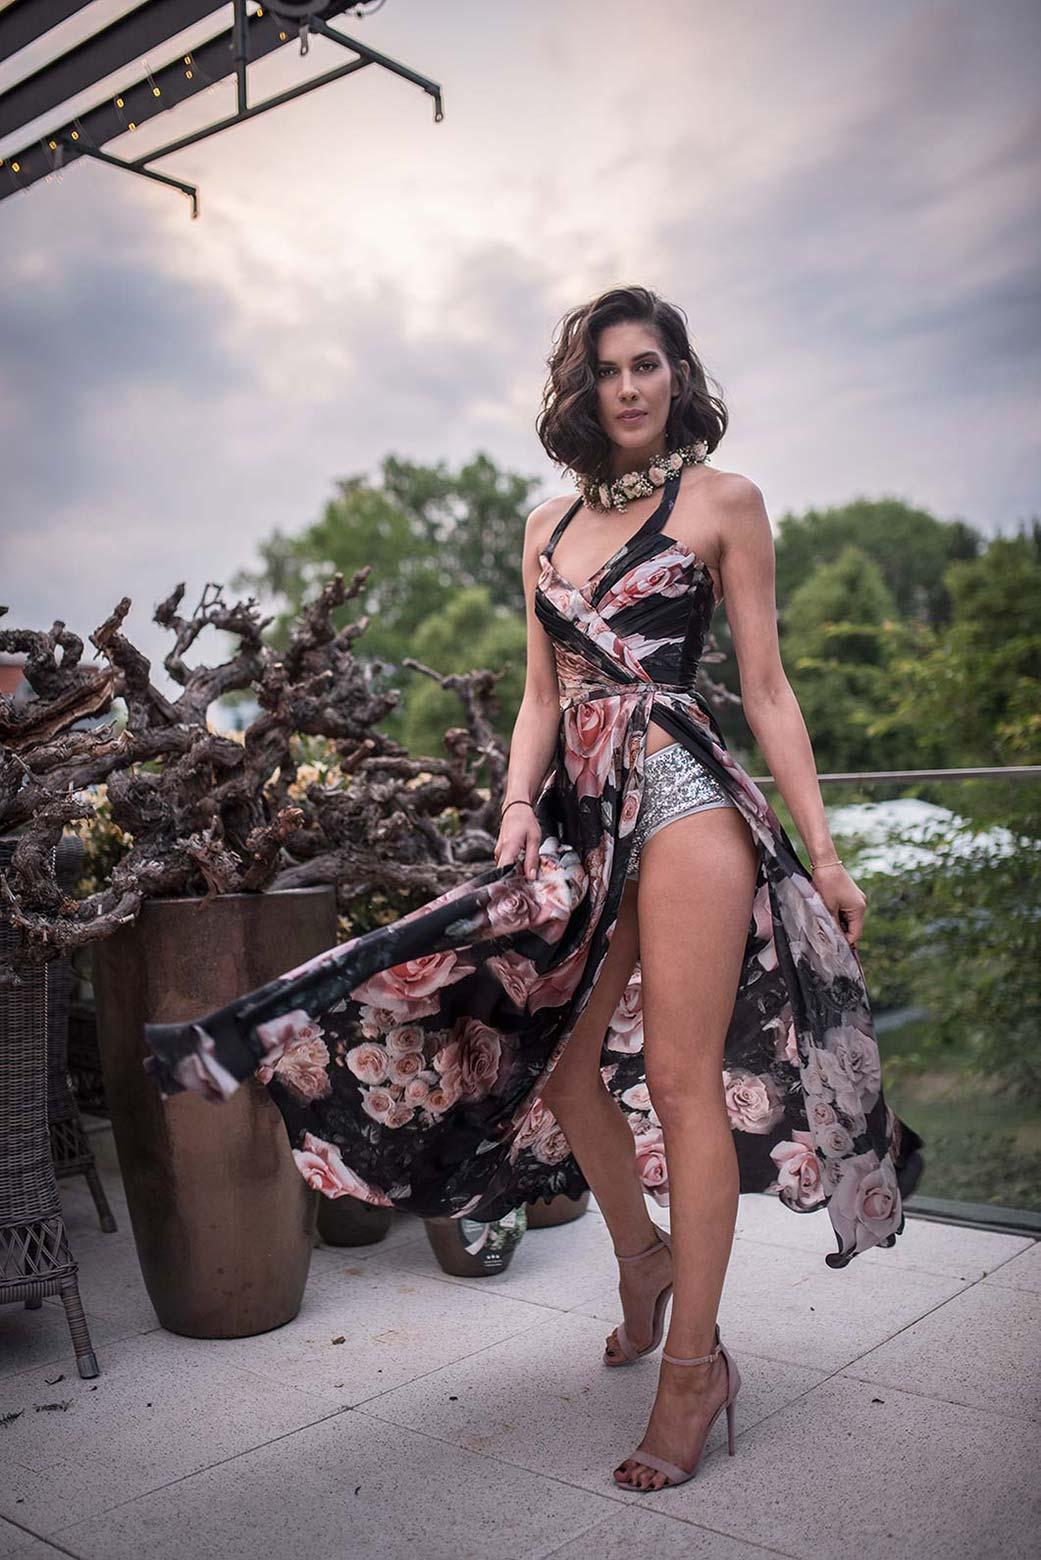 Show Flower feelings<br>- Aneta Vignerová, hedvábné šaty realizované na dražbu ve prospěch nadace Krása pomoci